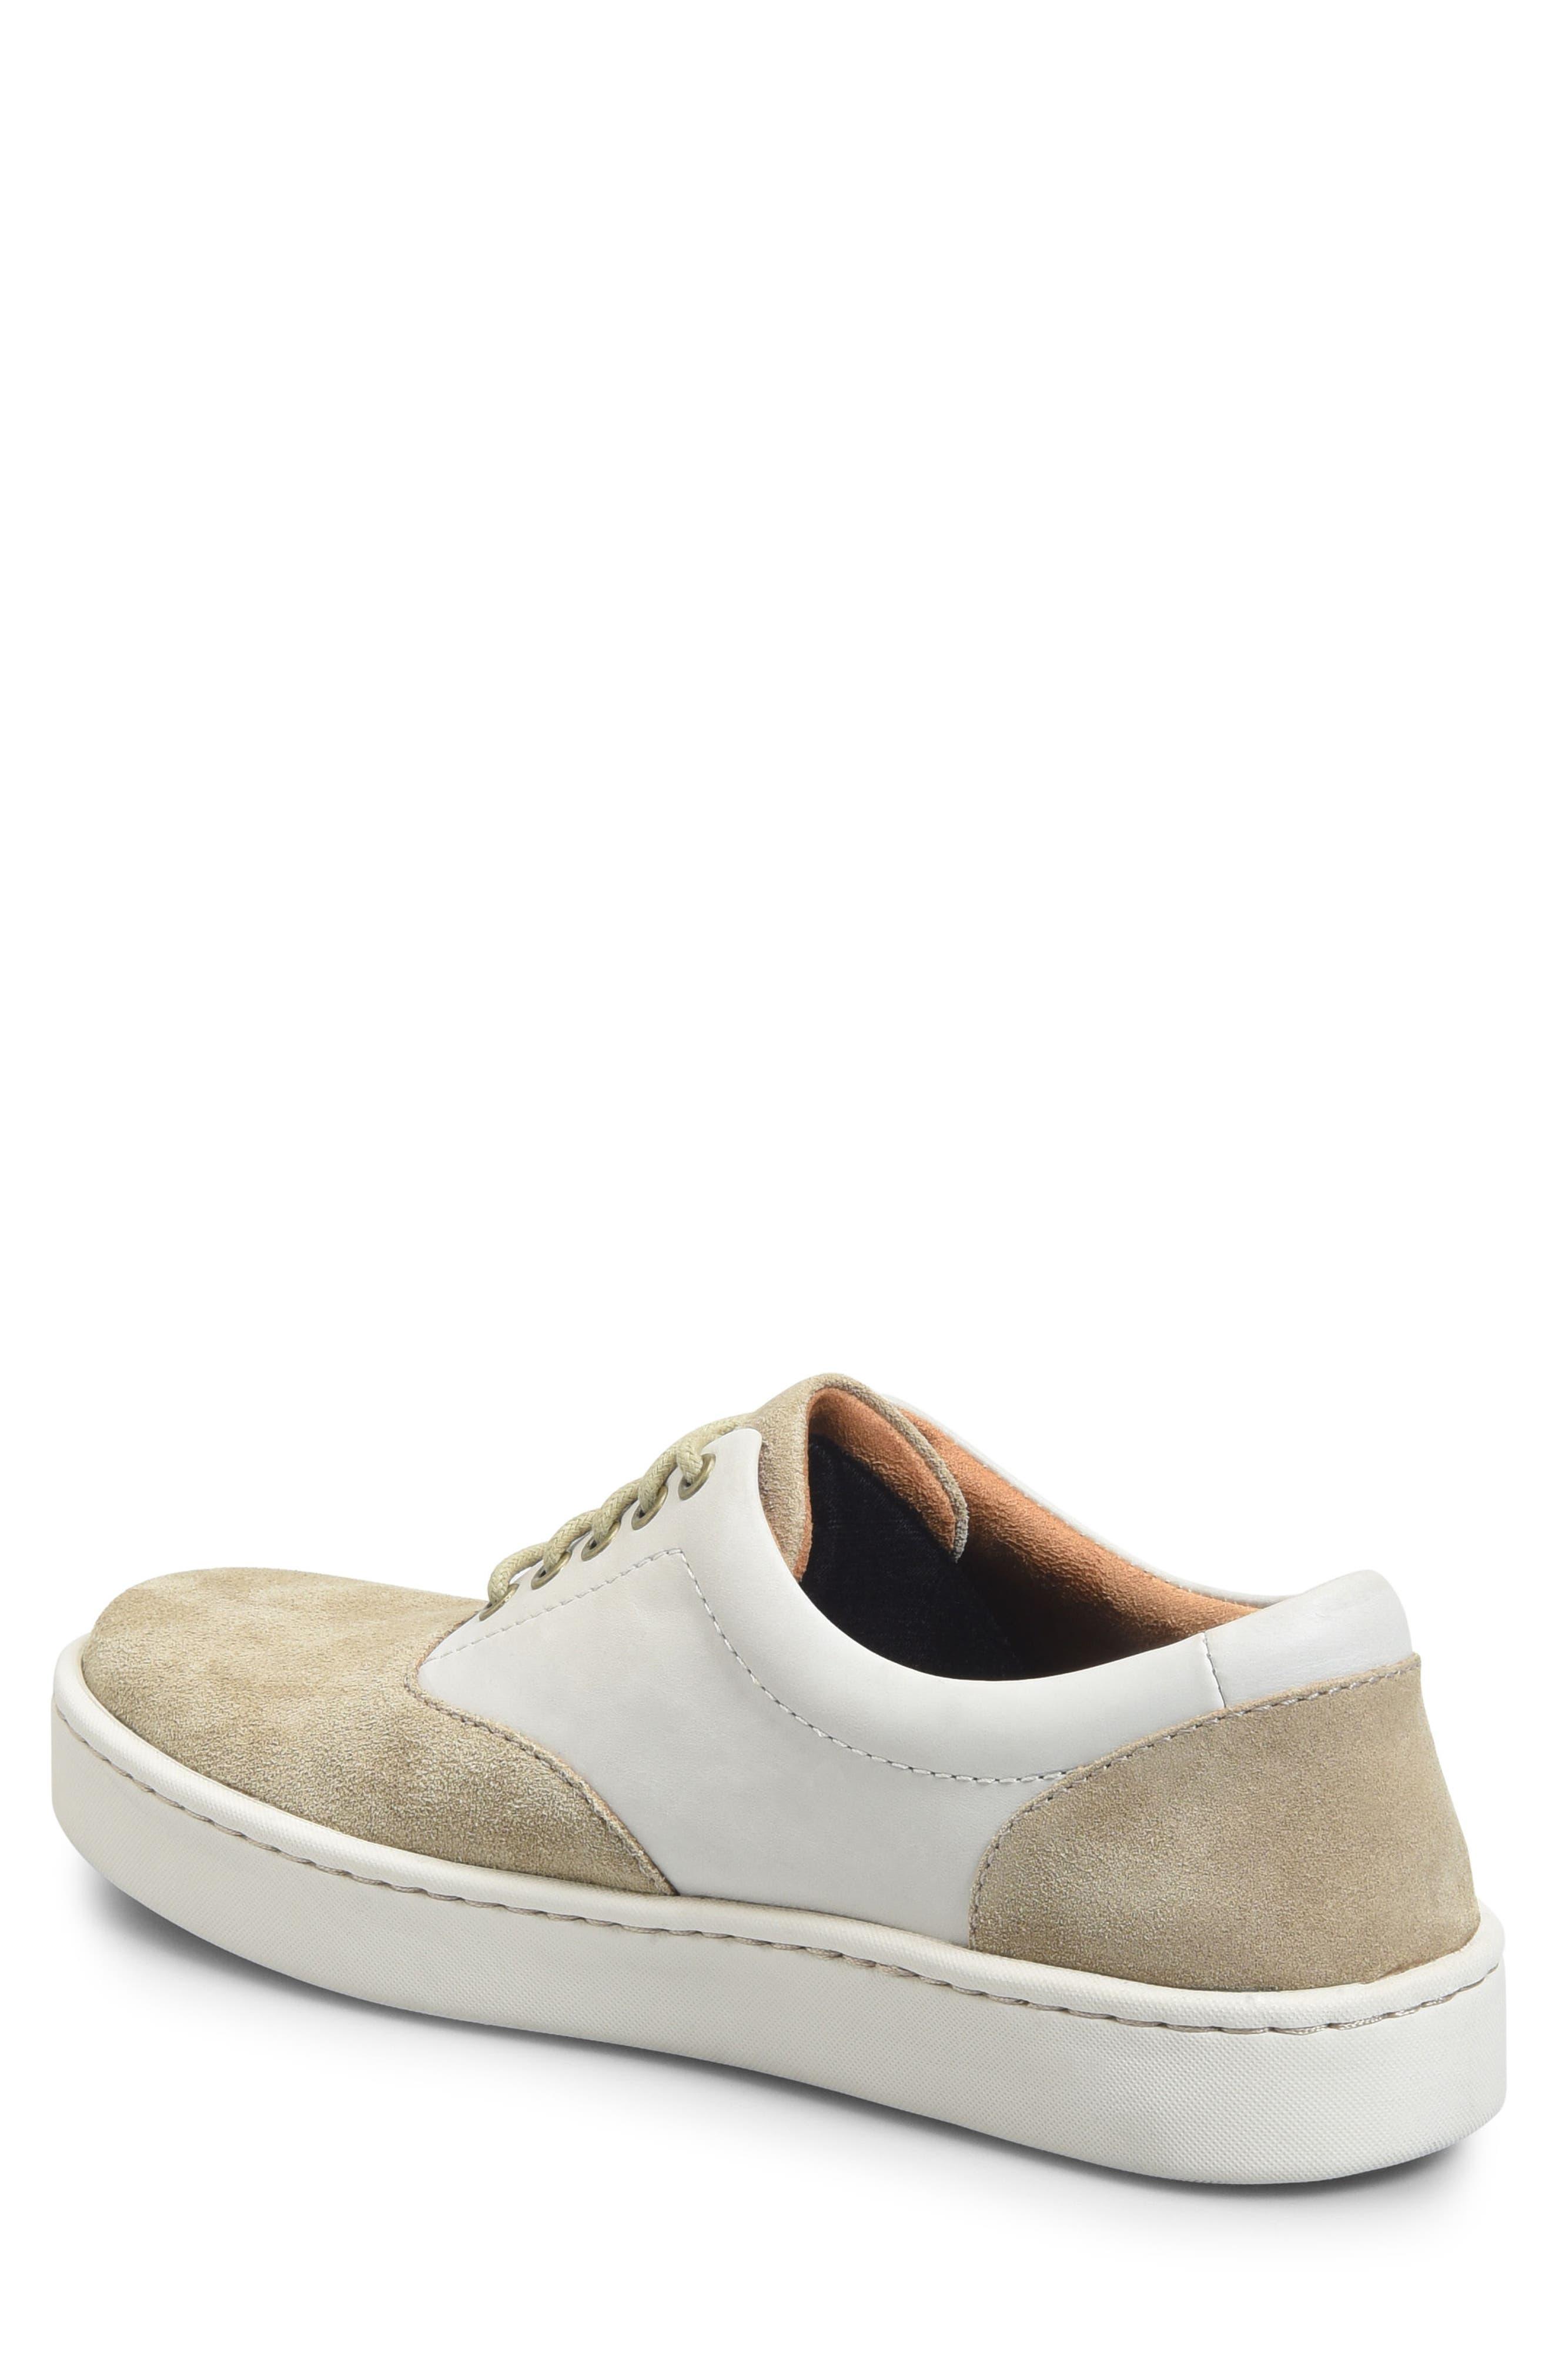 Keystone Low Top Sneaker,                             Alternate thumbnail 6, color,